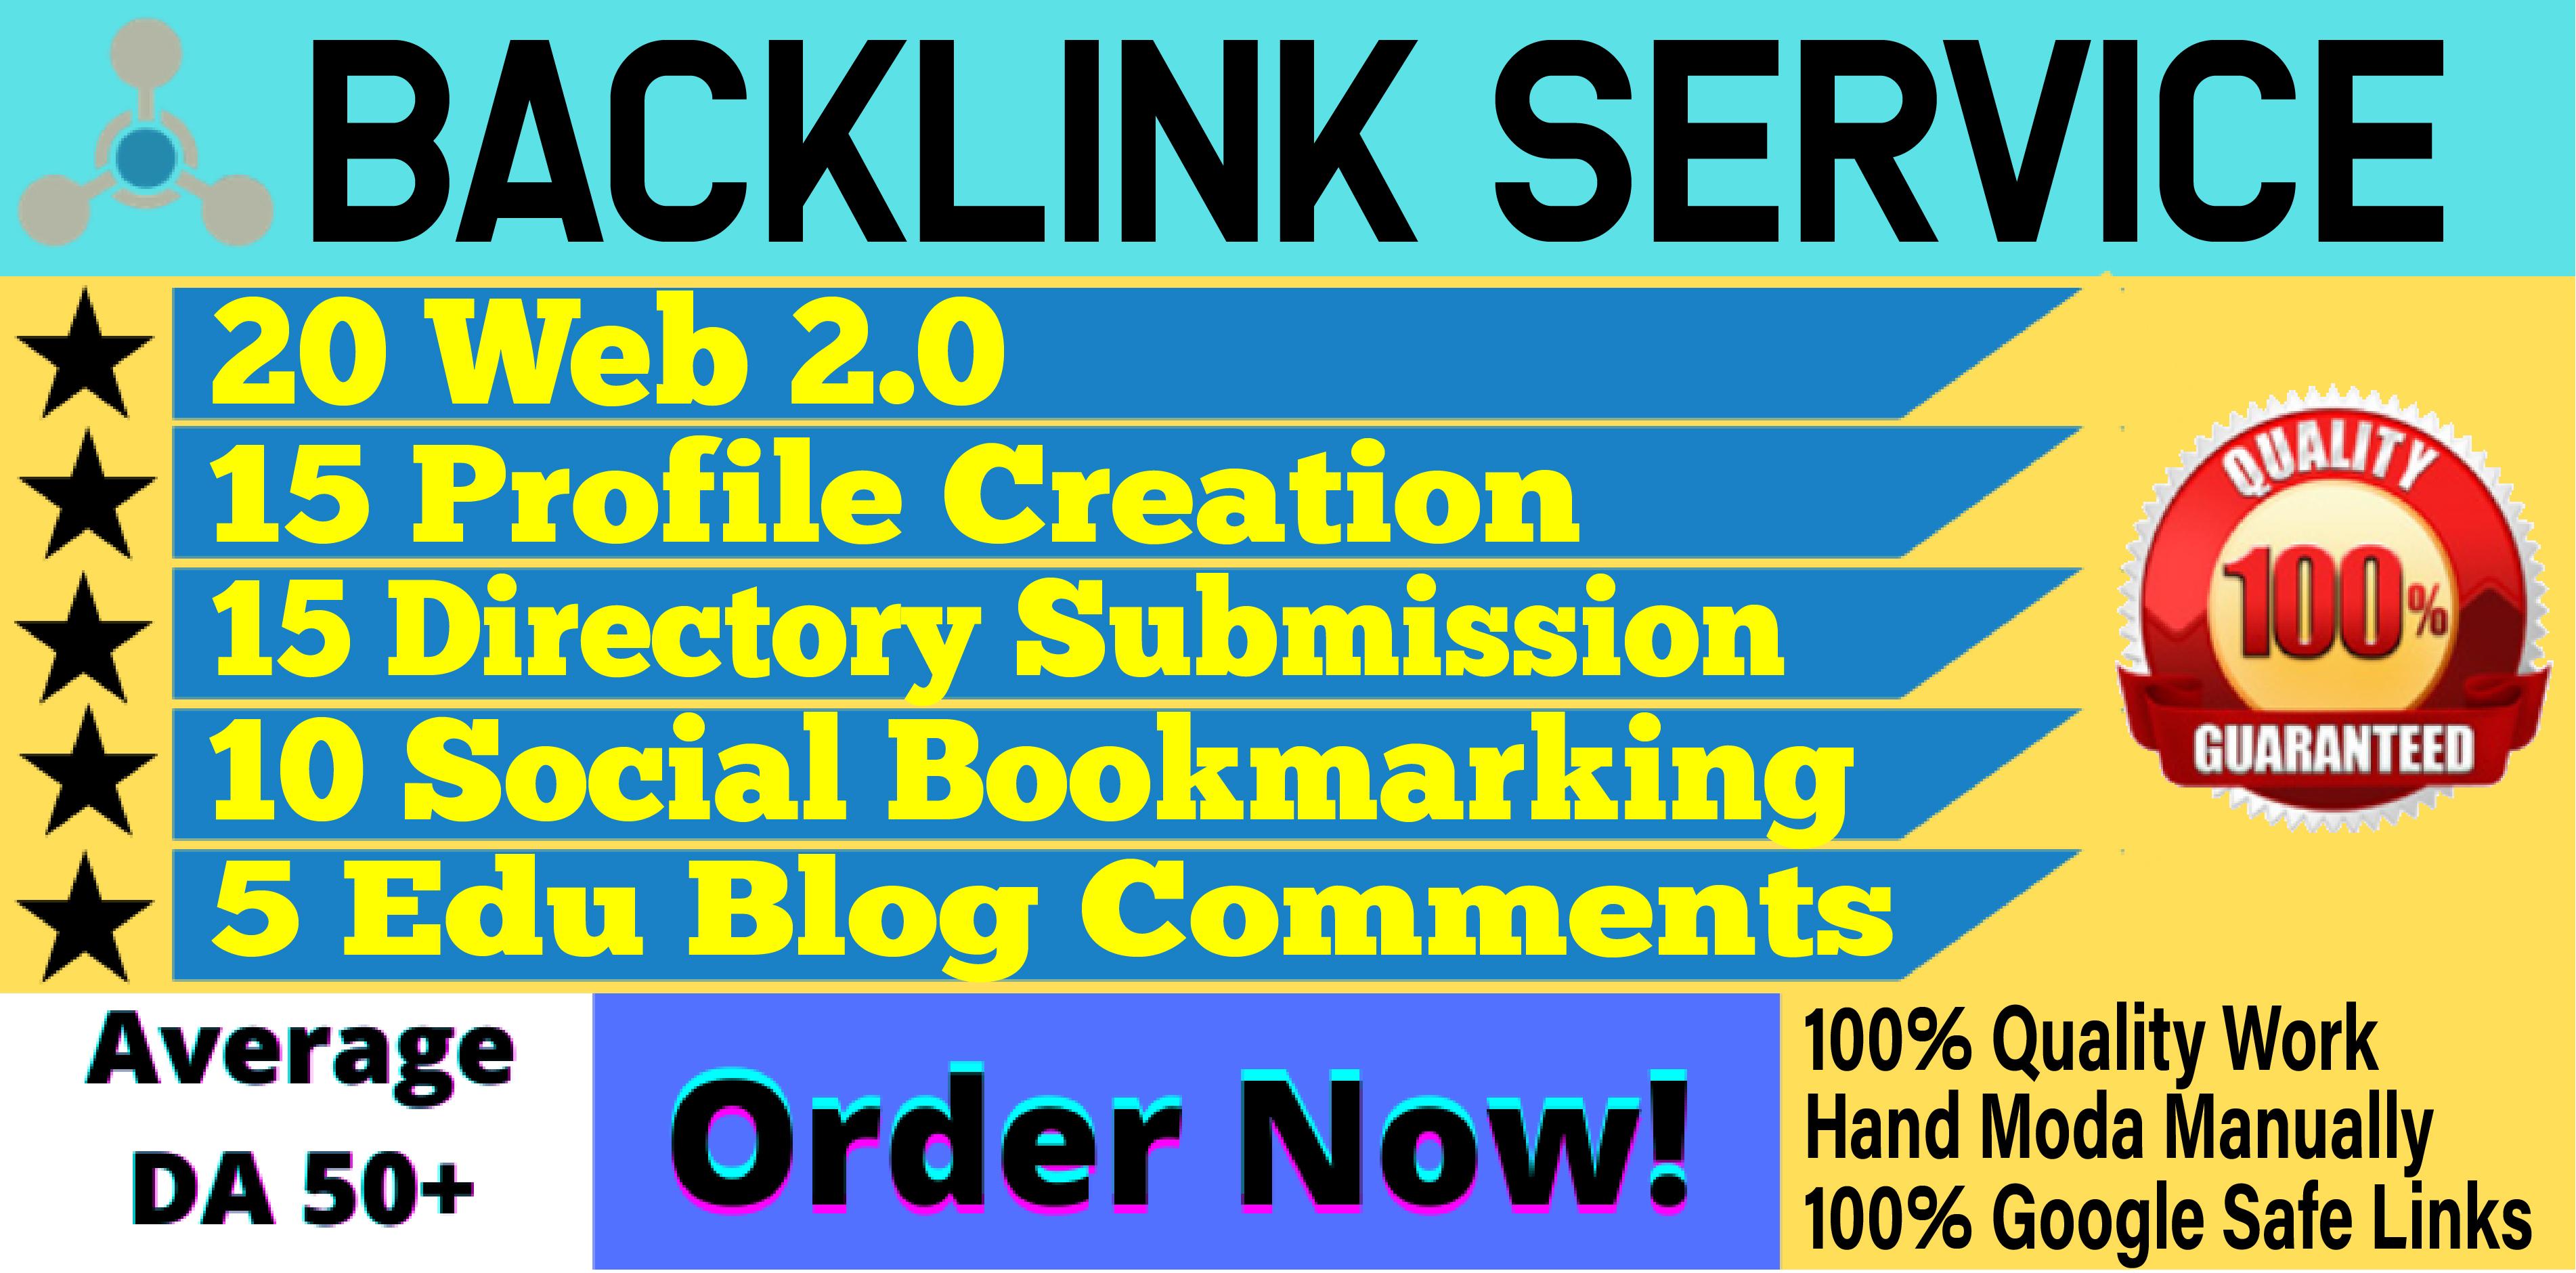 Top Ranking SEO Service - 65 Whitehat Authority Backlinks